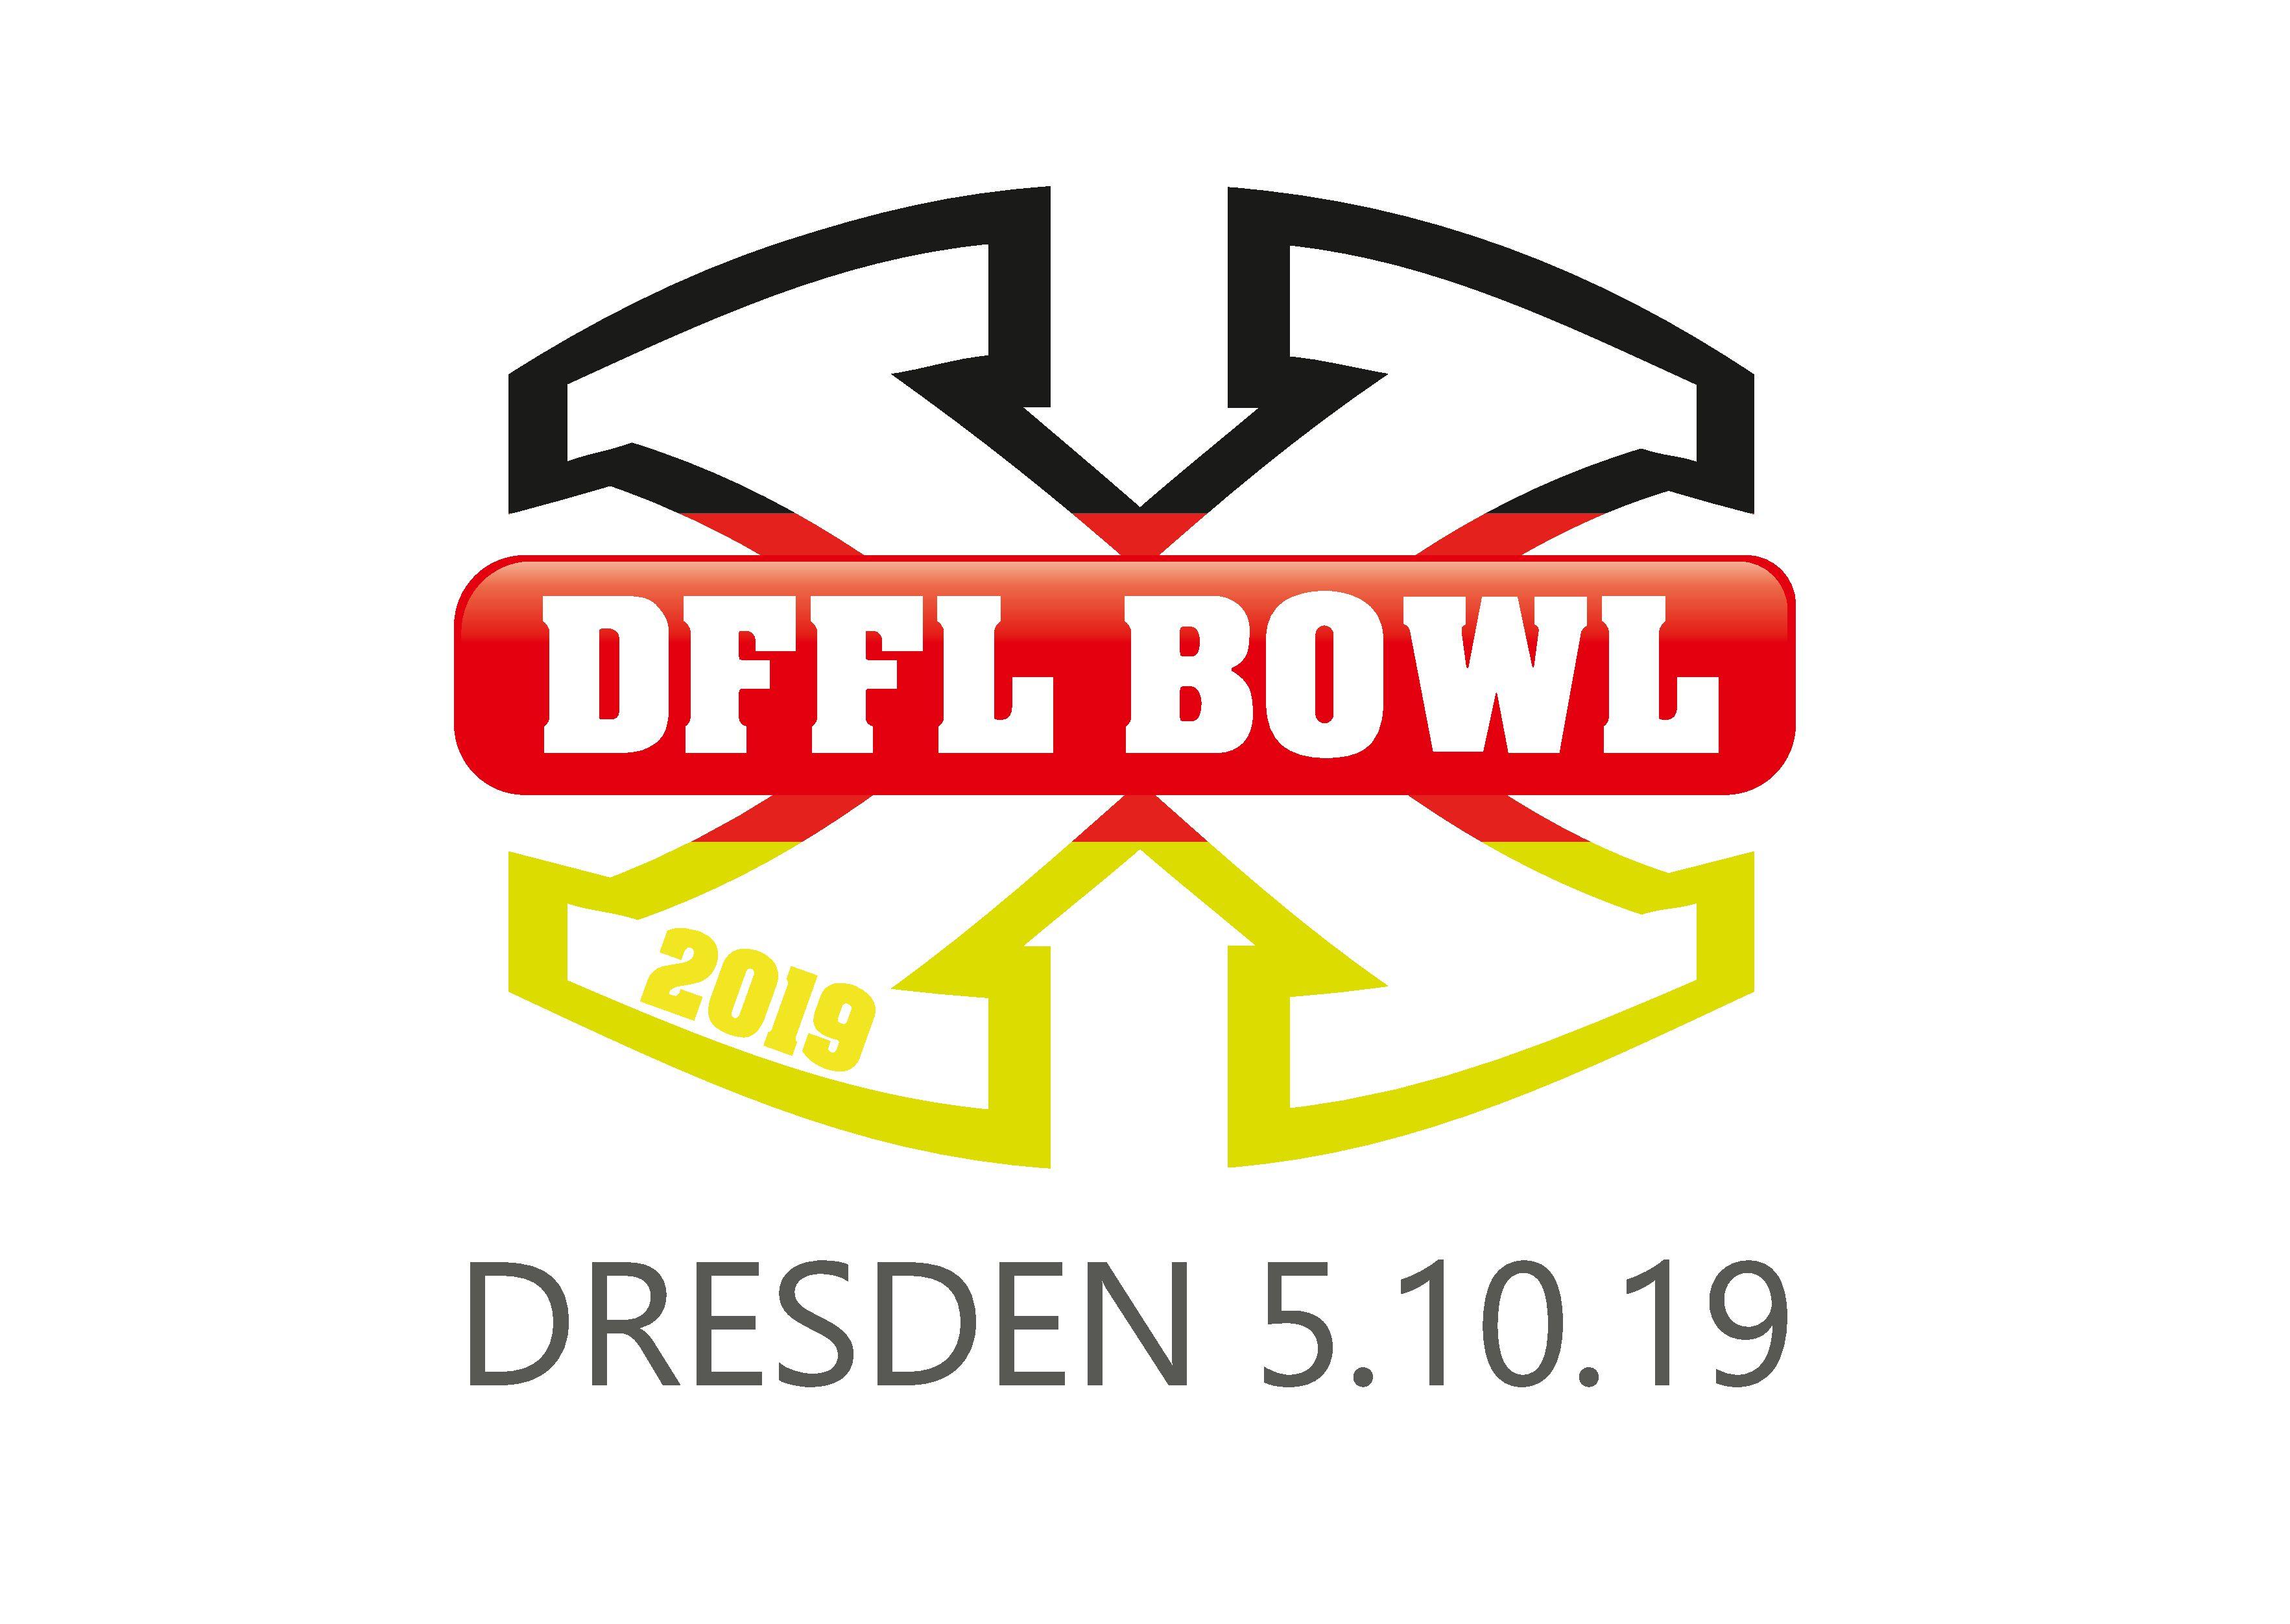 DFFL Bowl 2019 in Dresden